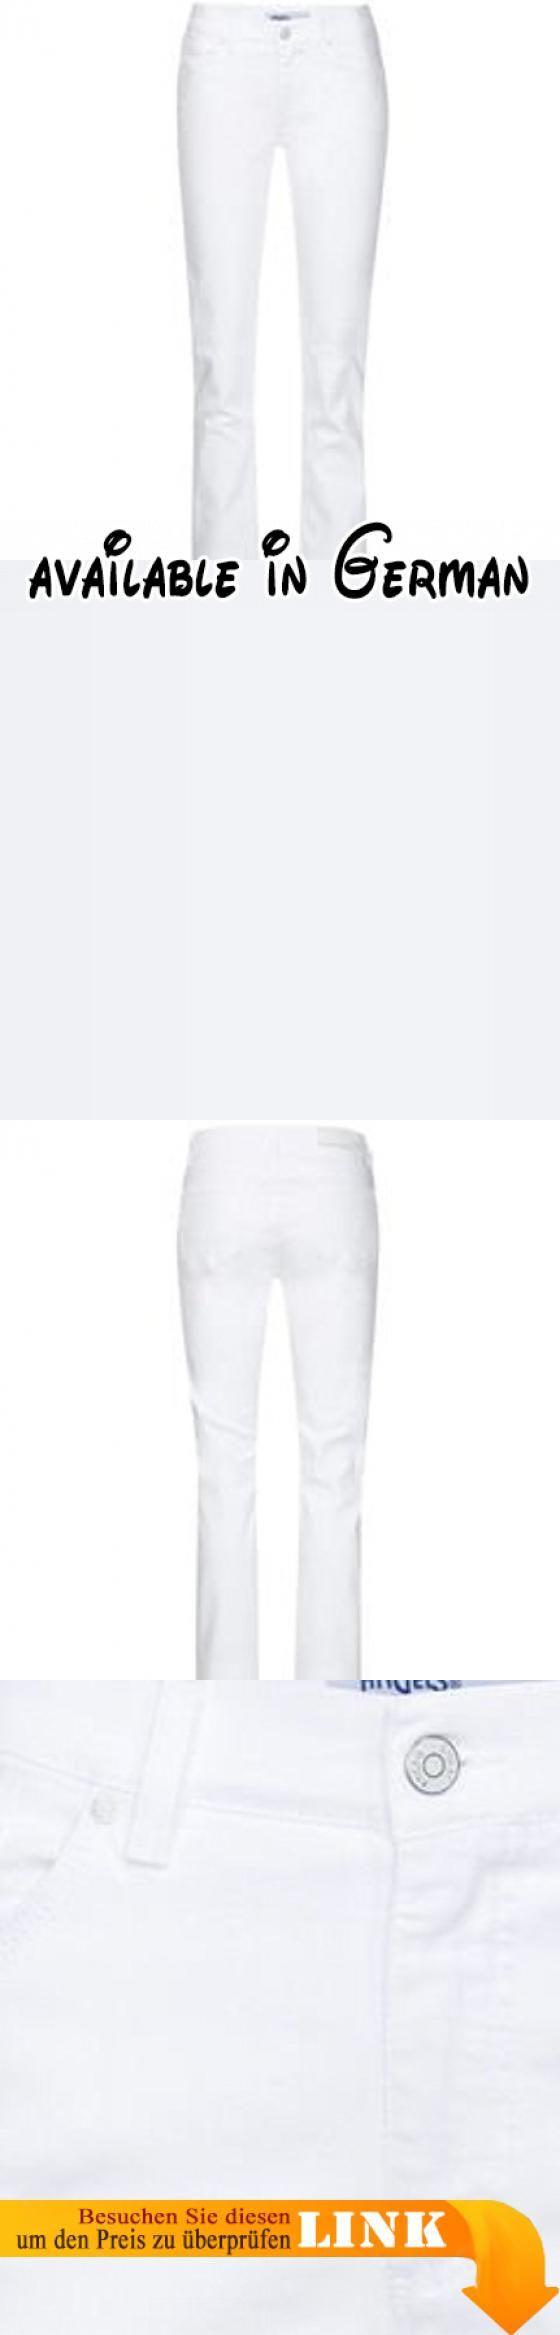 "Angels Damen Jeans ""Cici"" weiss (10) 36/30. Material: 85% Baumwolle, 13% Polyester, 2% Elasthan. Teile tierischen Ursprungs: Nein #Apparel #PANTS"